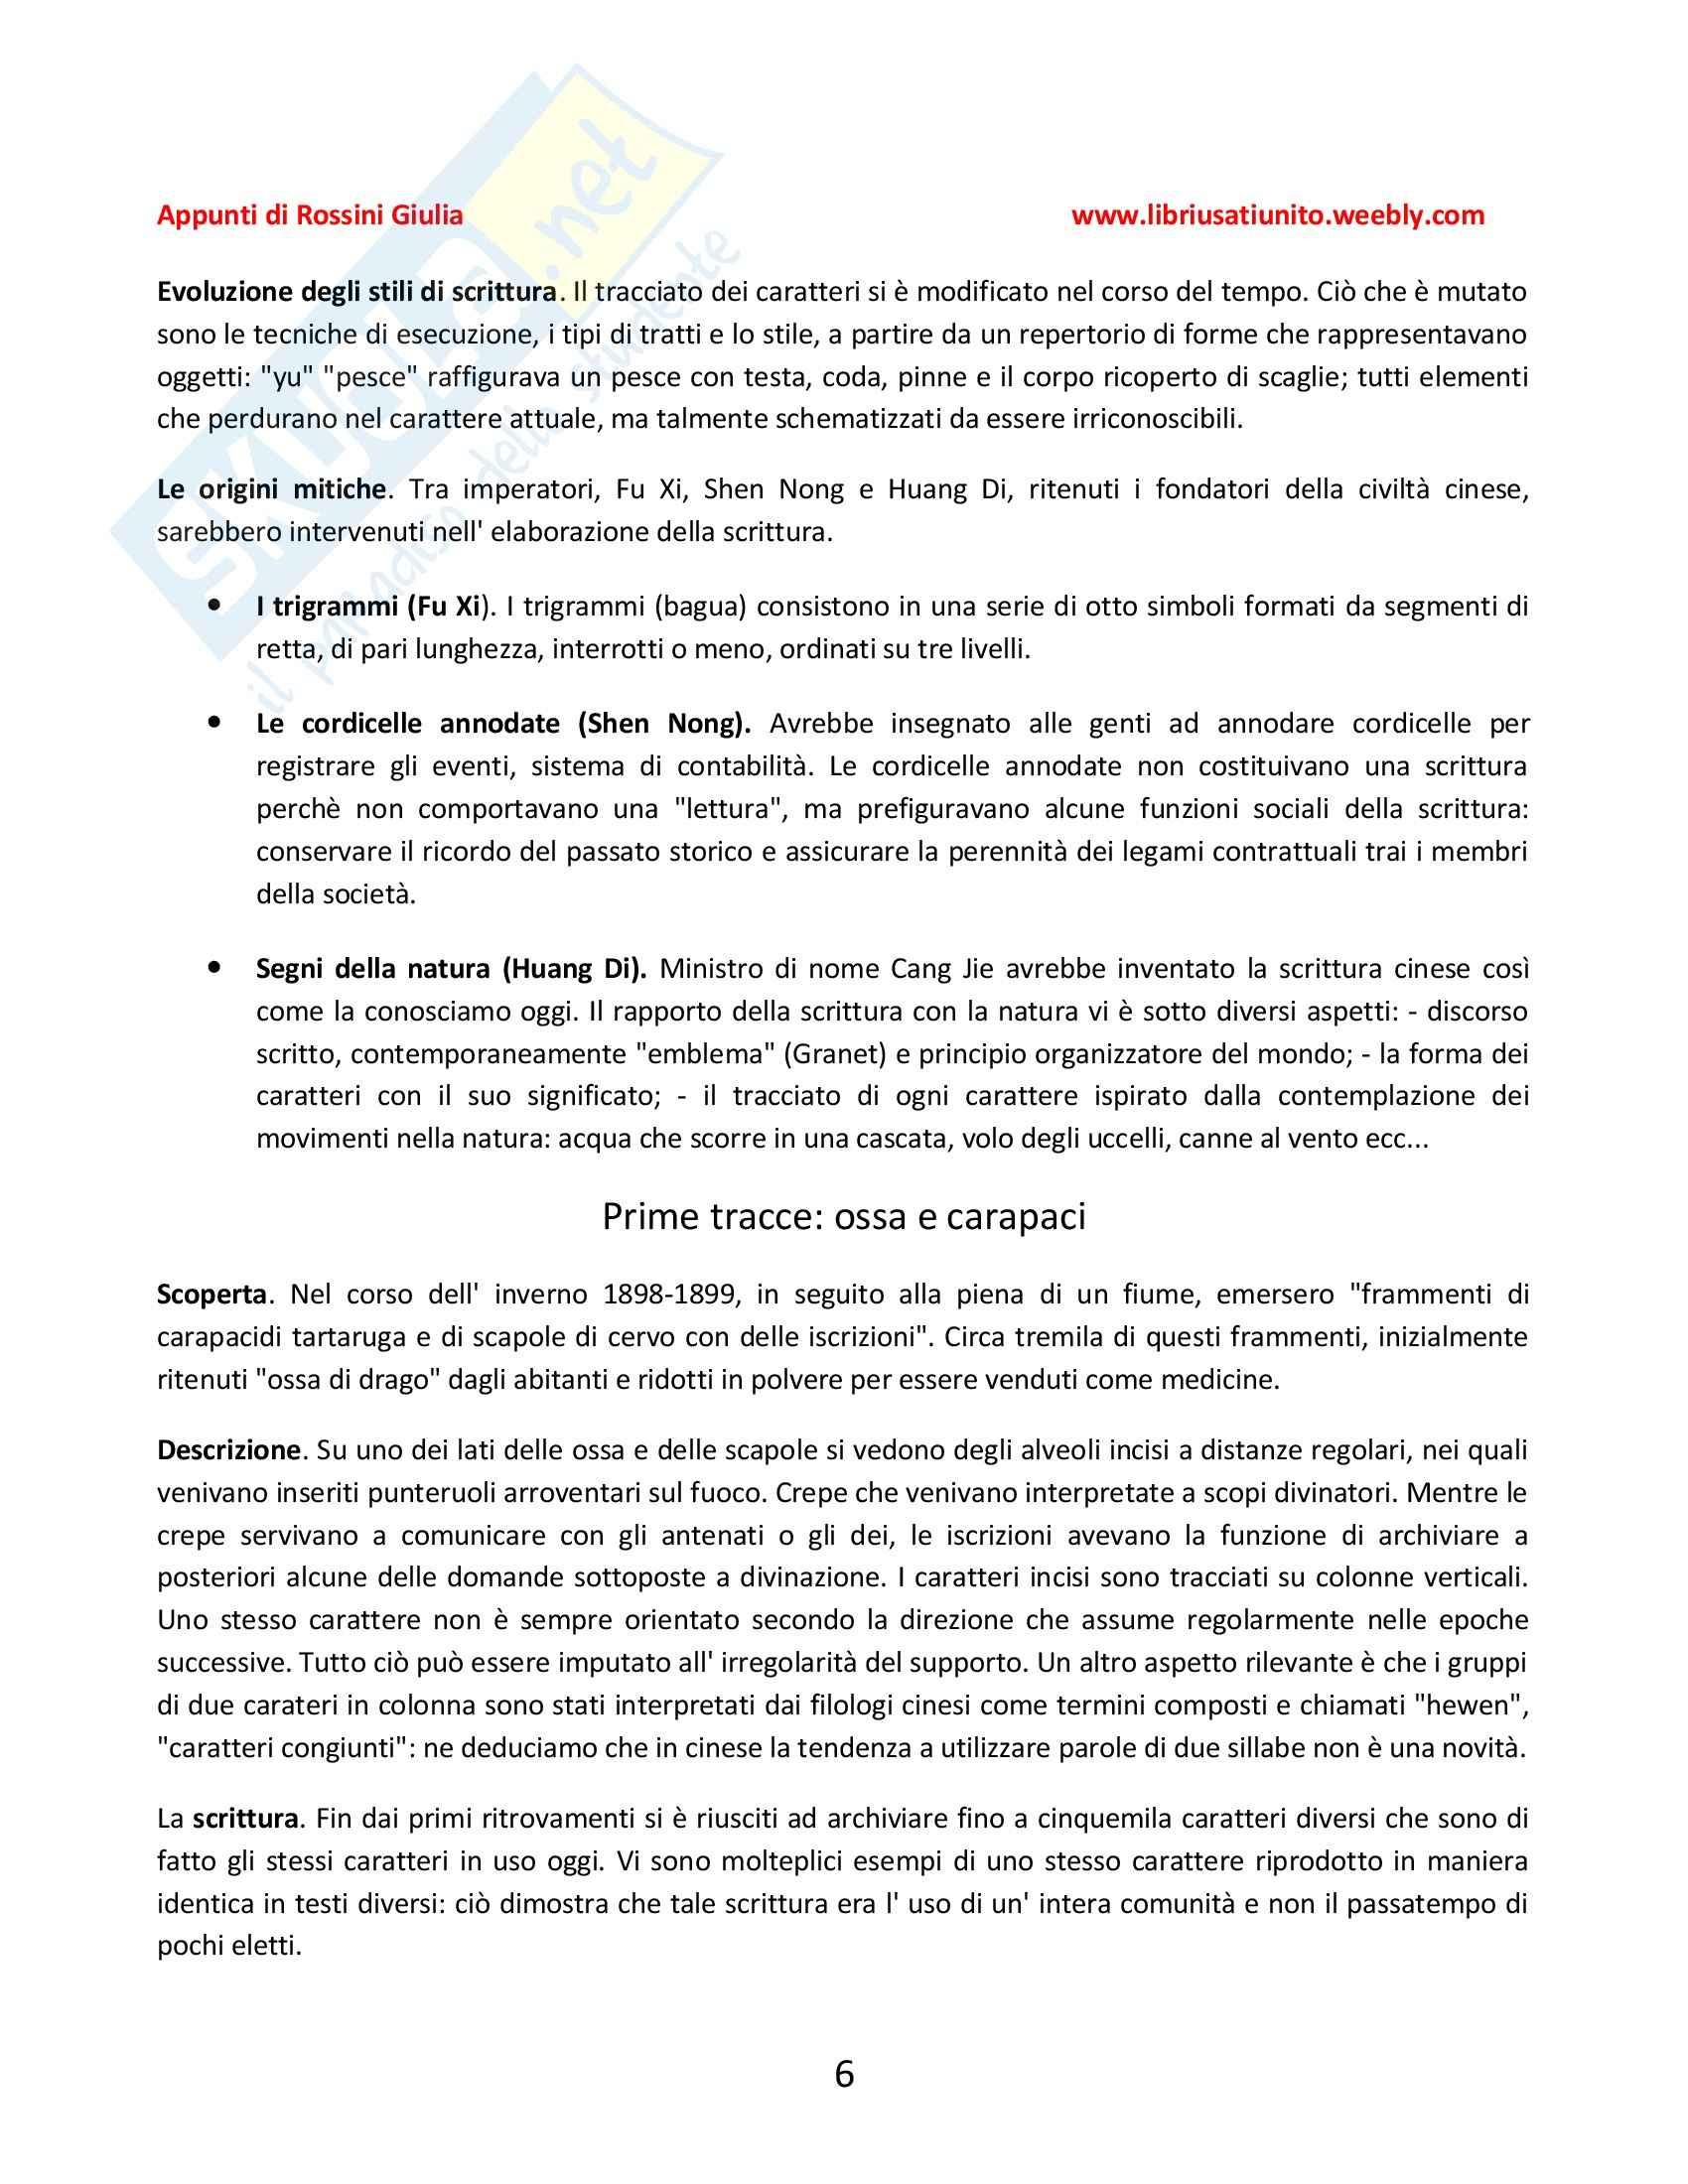 La scrittura cinese, Alleton - Riassunto esame Pag. 6